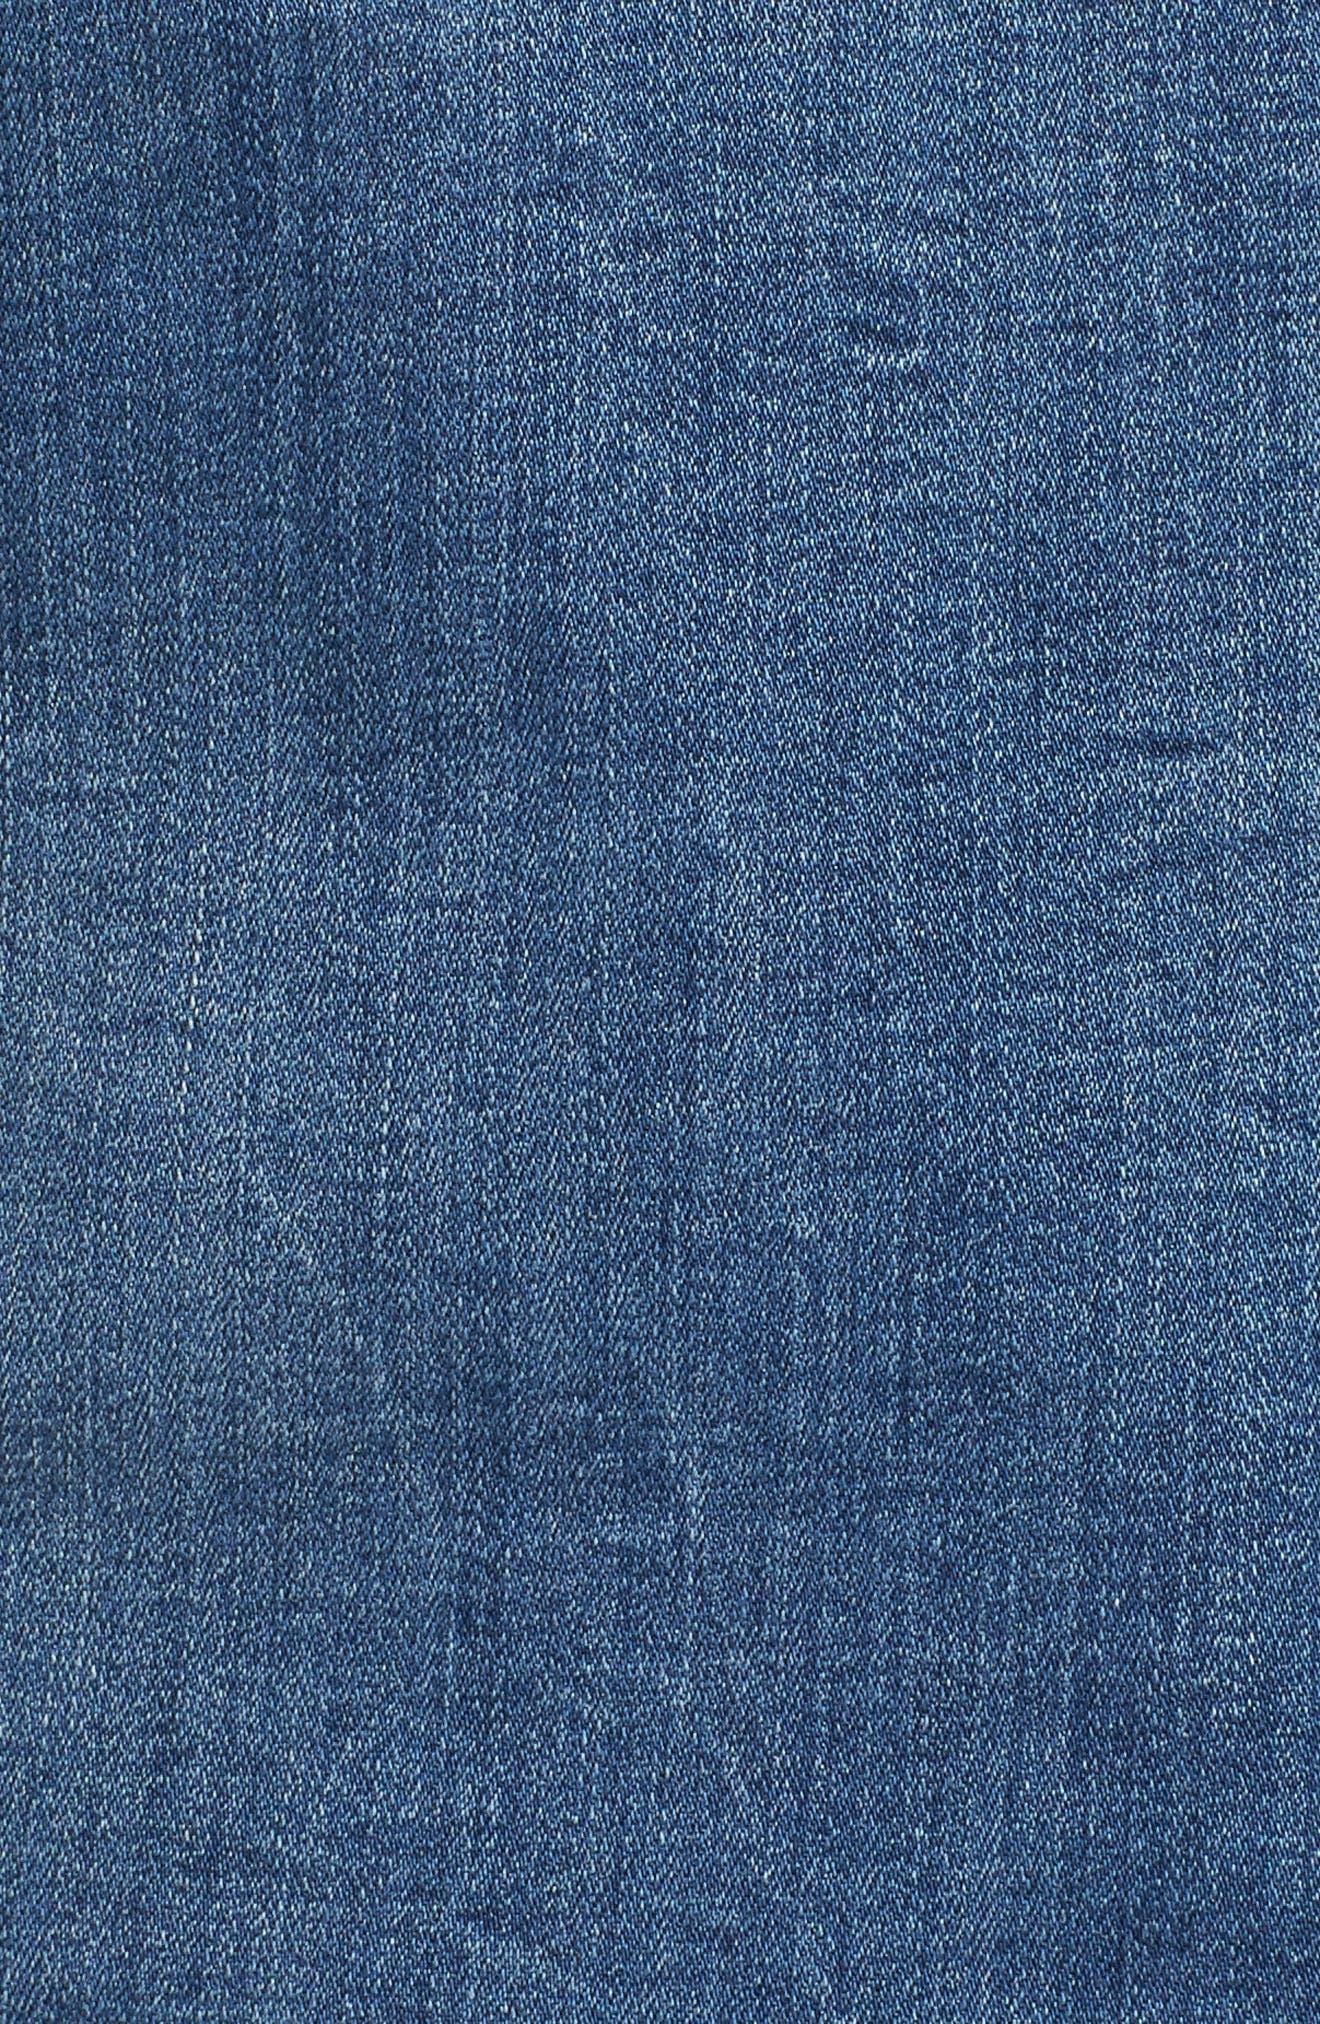 Alternate Image 6  - REBEL WILSON X ANGELS Just Fan Me Denim Jacket (Plus Size)